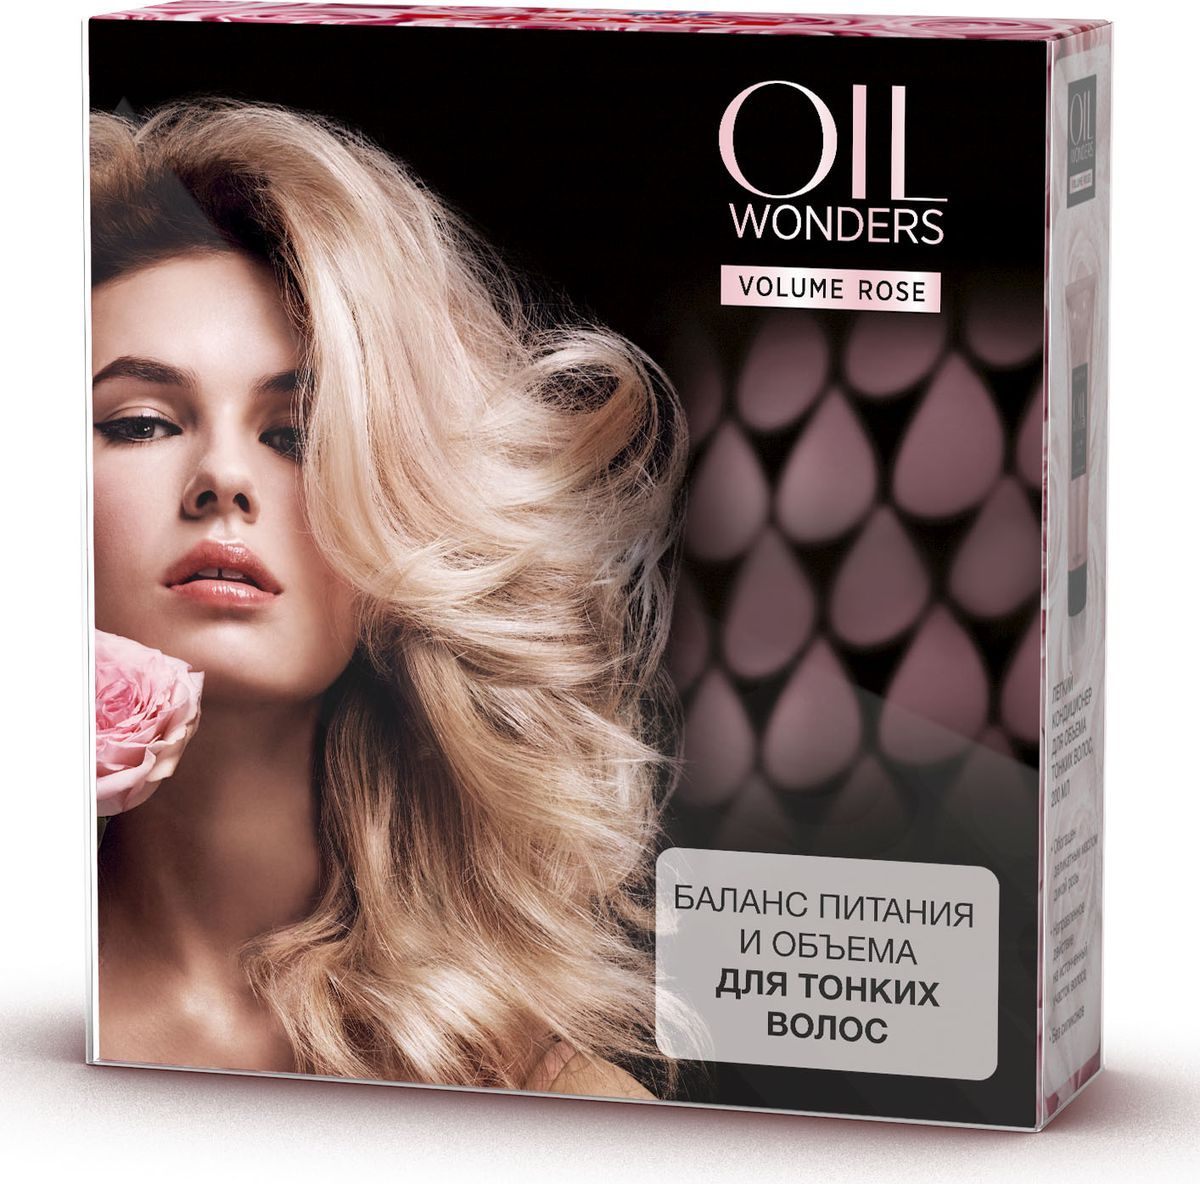 Matrix Набор Oil Wonders Volume Rose matrix oil wonders volume rose plumping mousse объем 250 мл